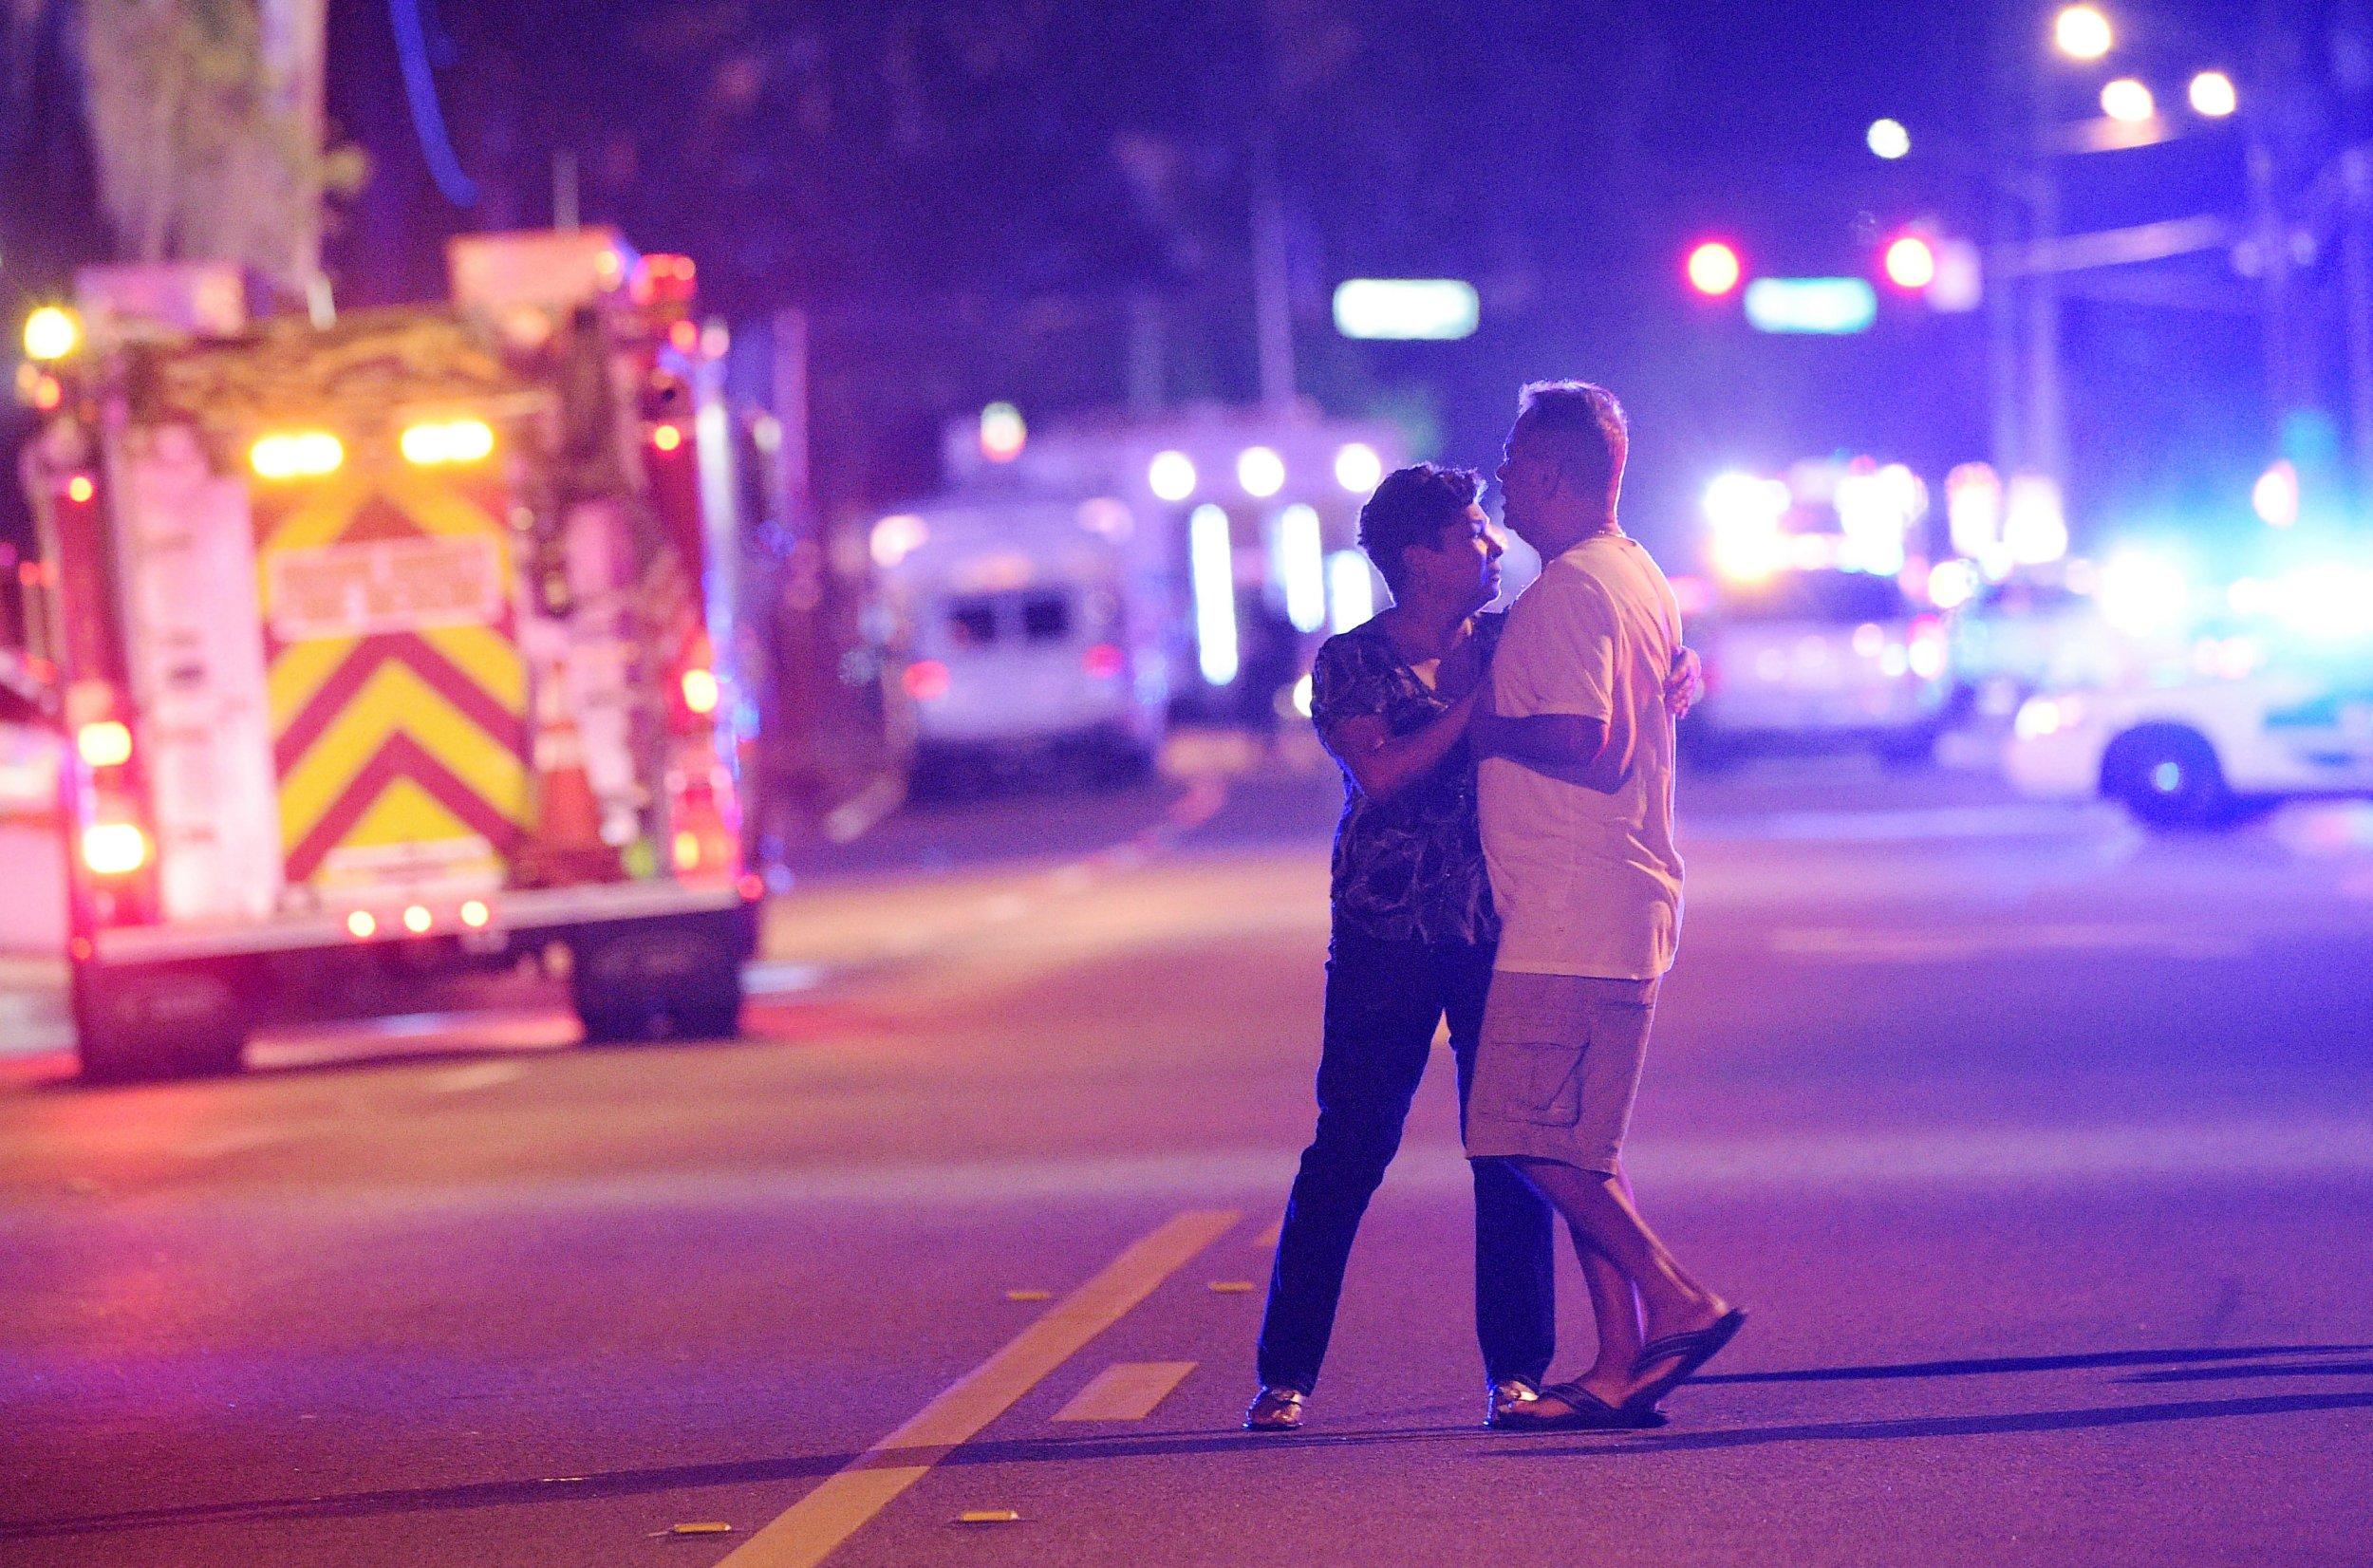 Orlando gunman describes himself as 'Islamic soldier' in chilling 911 transcripts